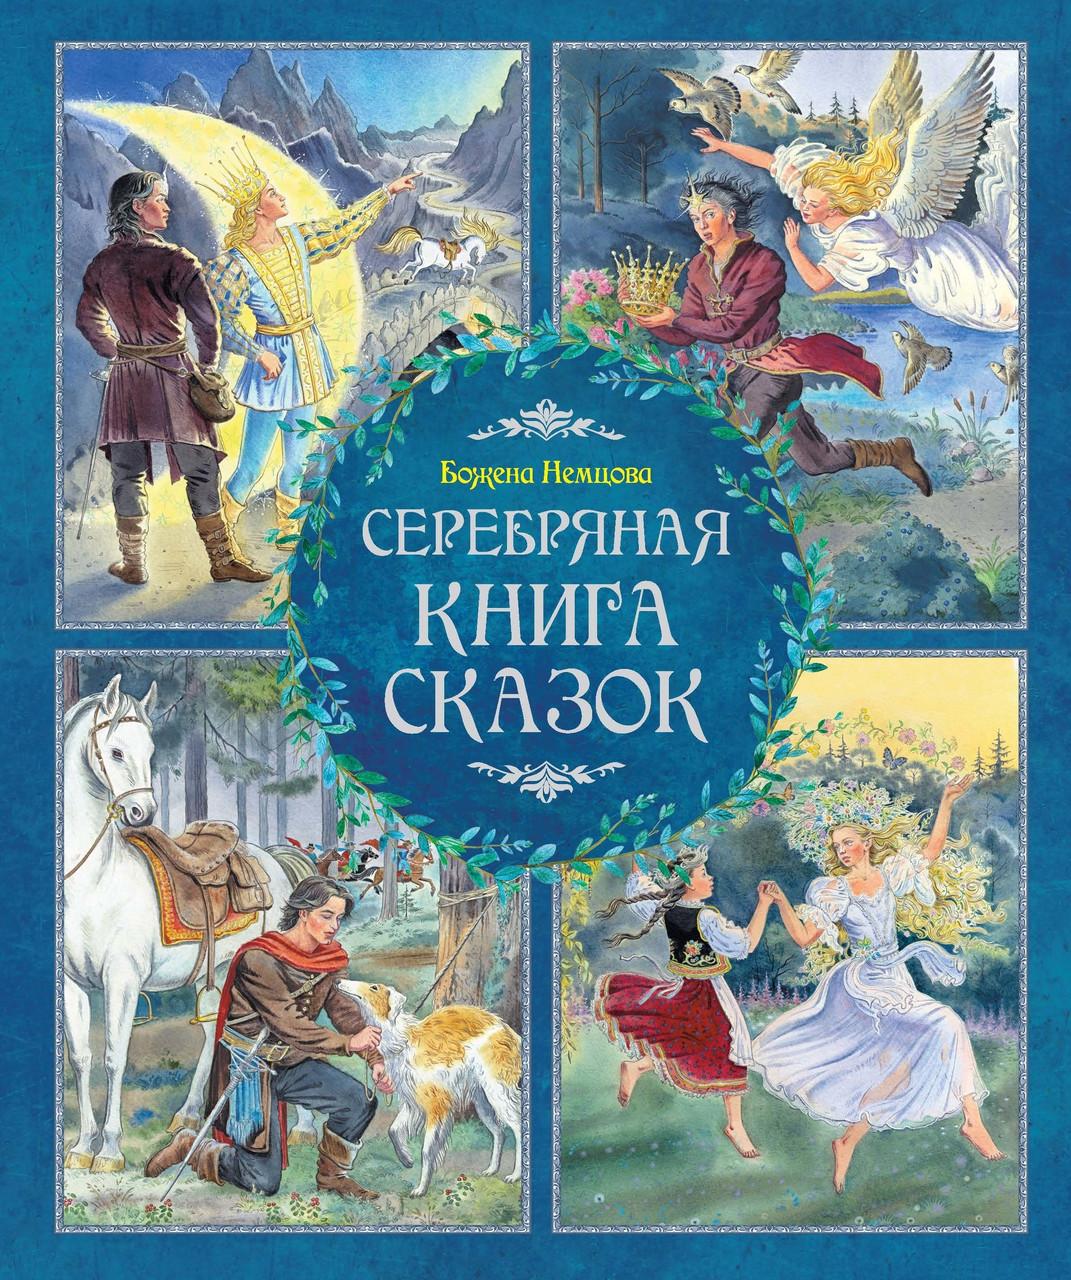 Божена Немцова. Серебряная книга сказок